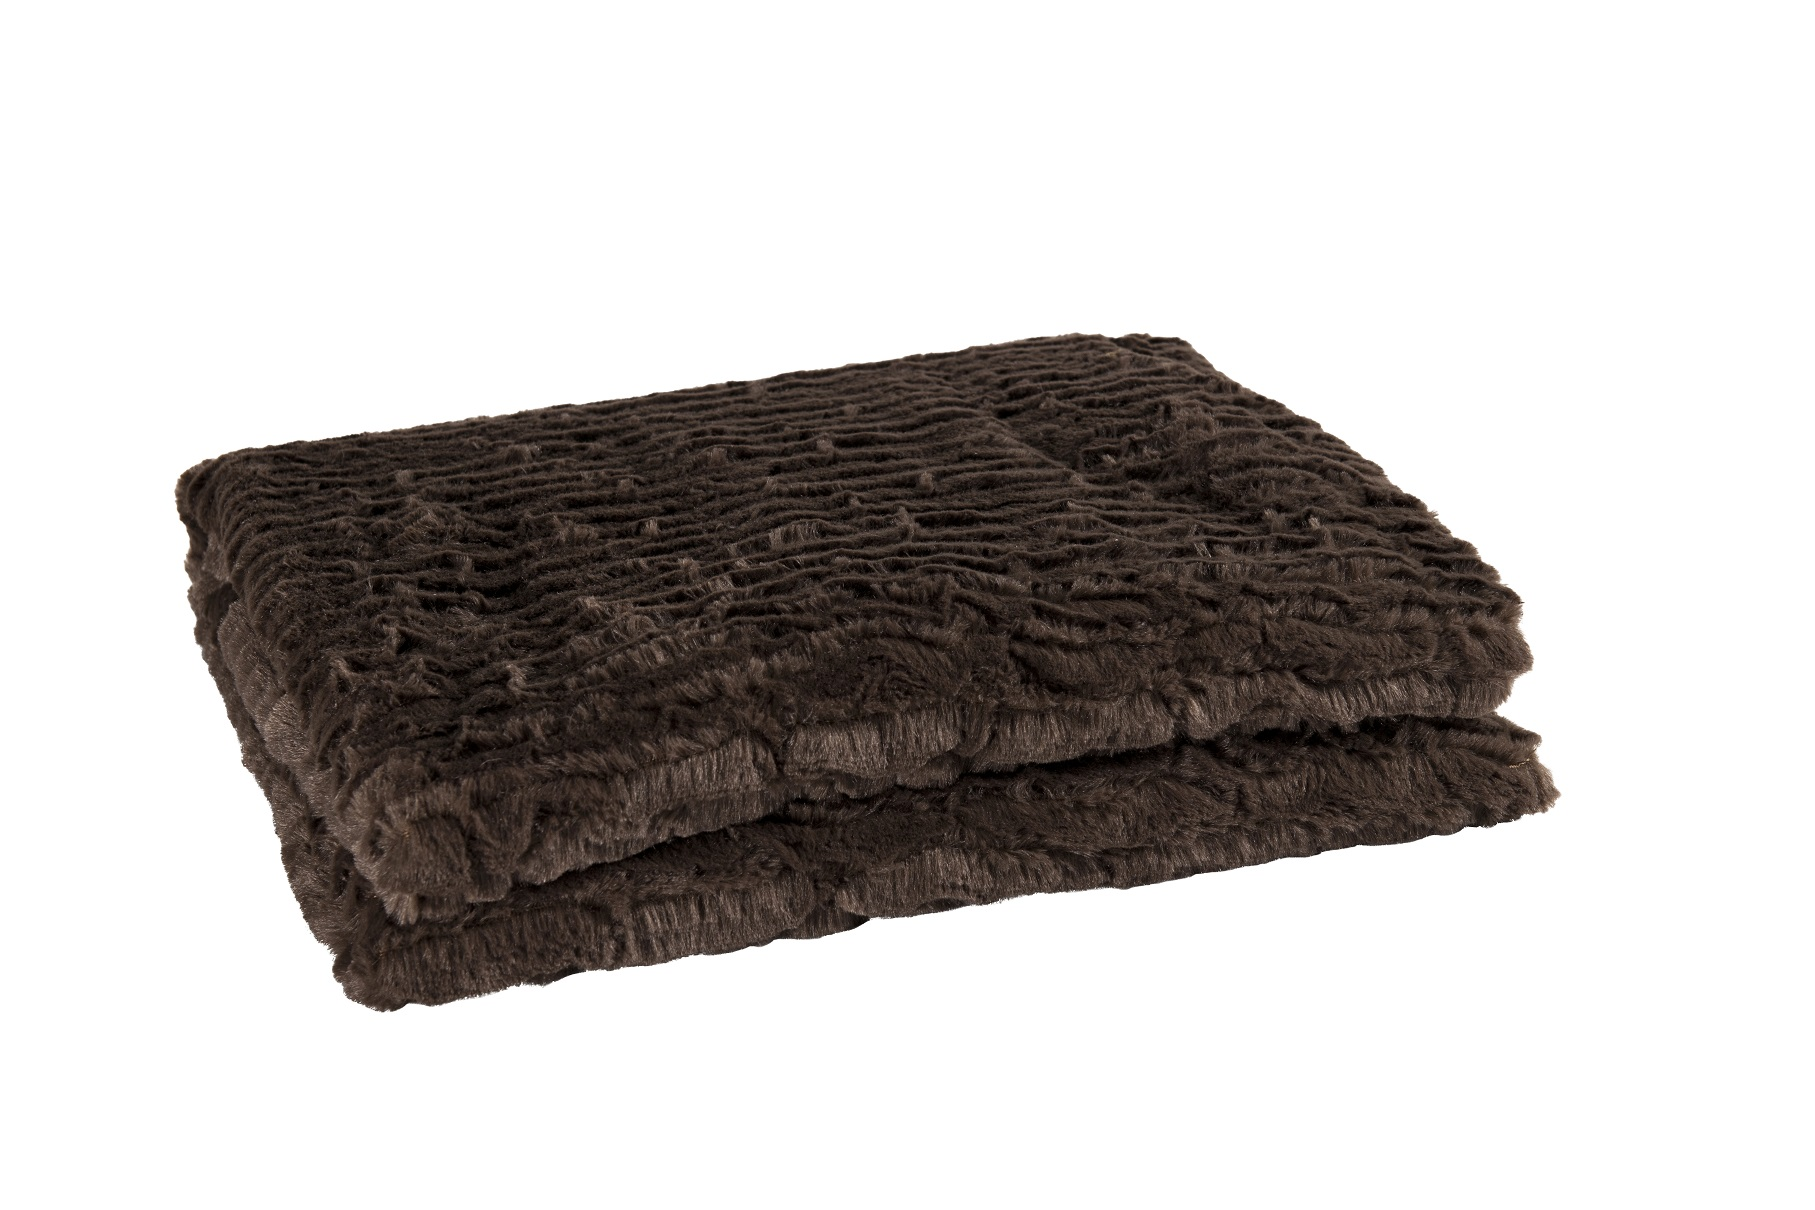 indoor tagesdecke izmir braun 130cm x 180cm plaid. Black Bedroom Furniture Sets. Home Design Ideas